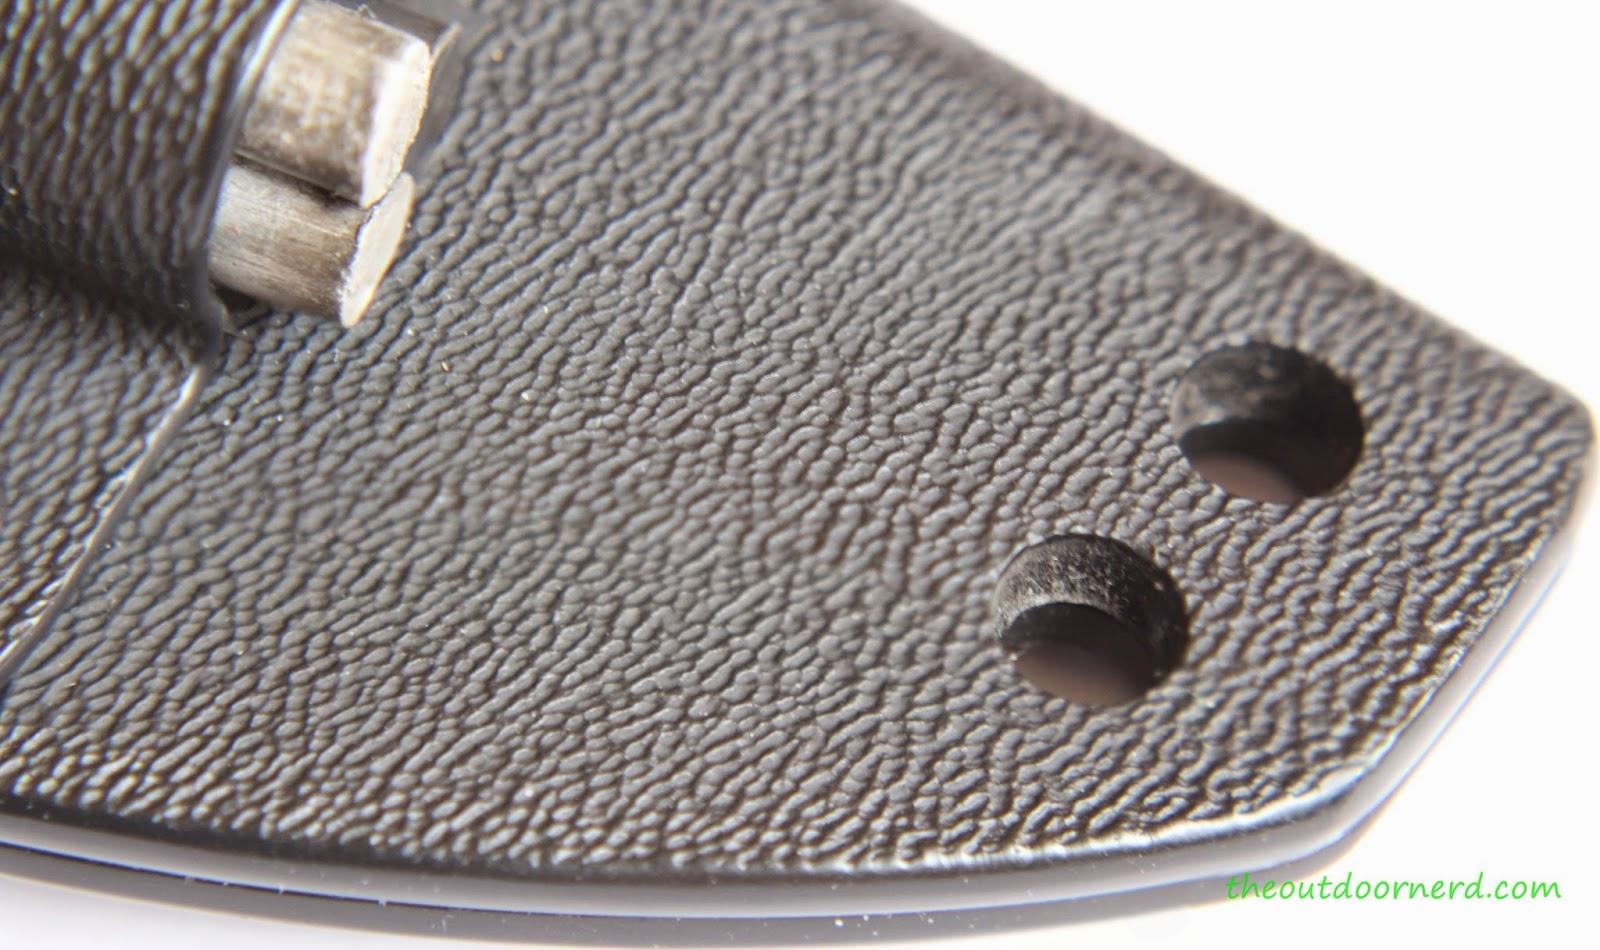 Tops Fieldcraft Fixed Blade Knife: Sheath View 4